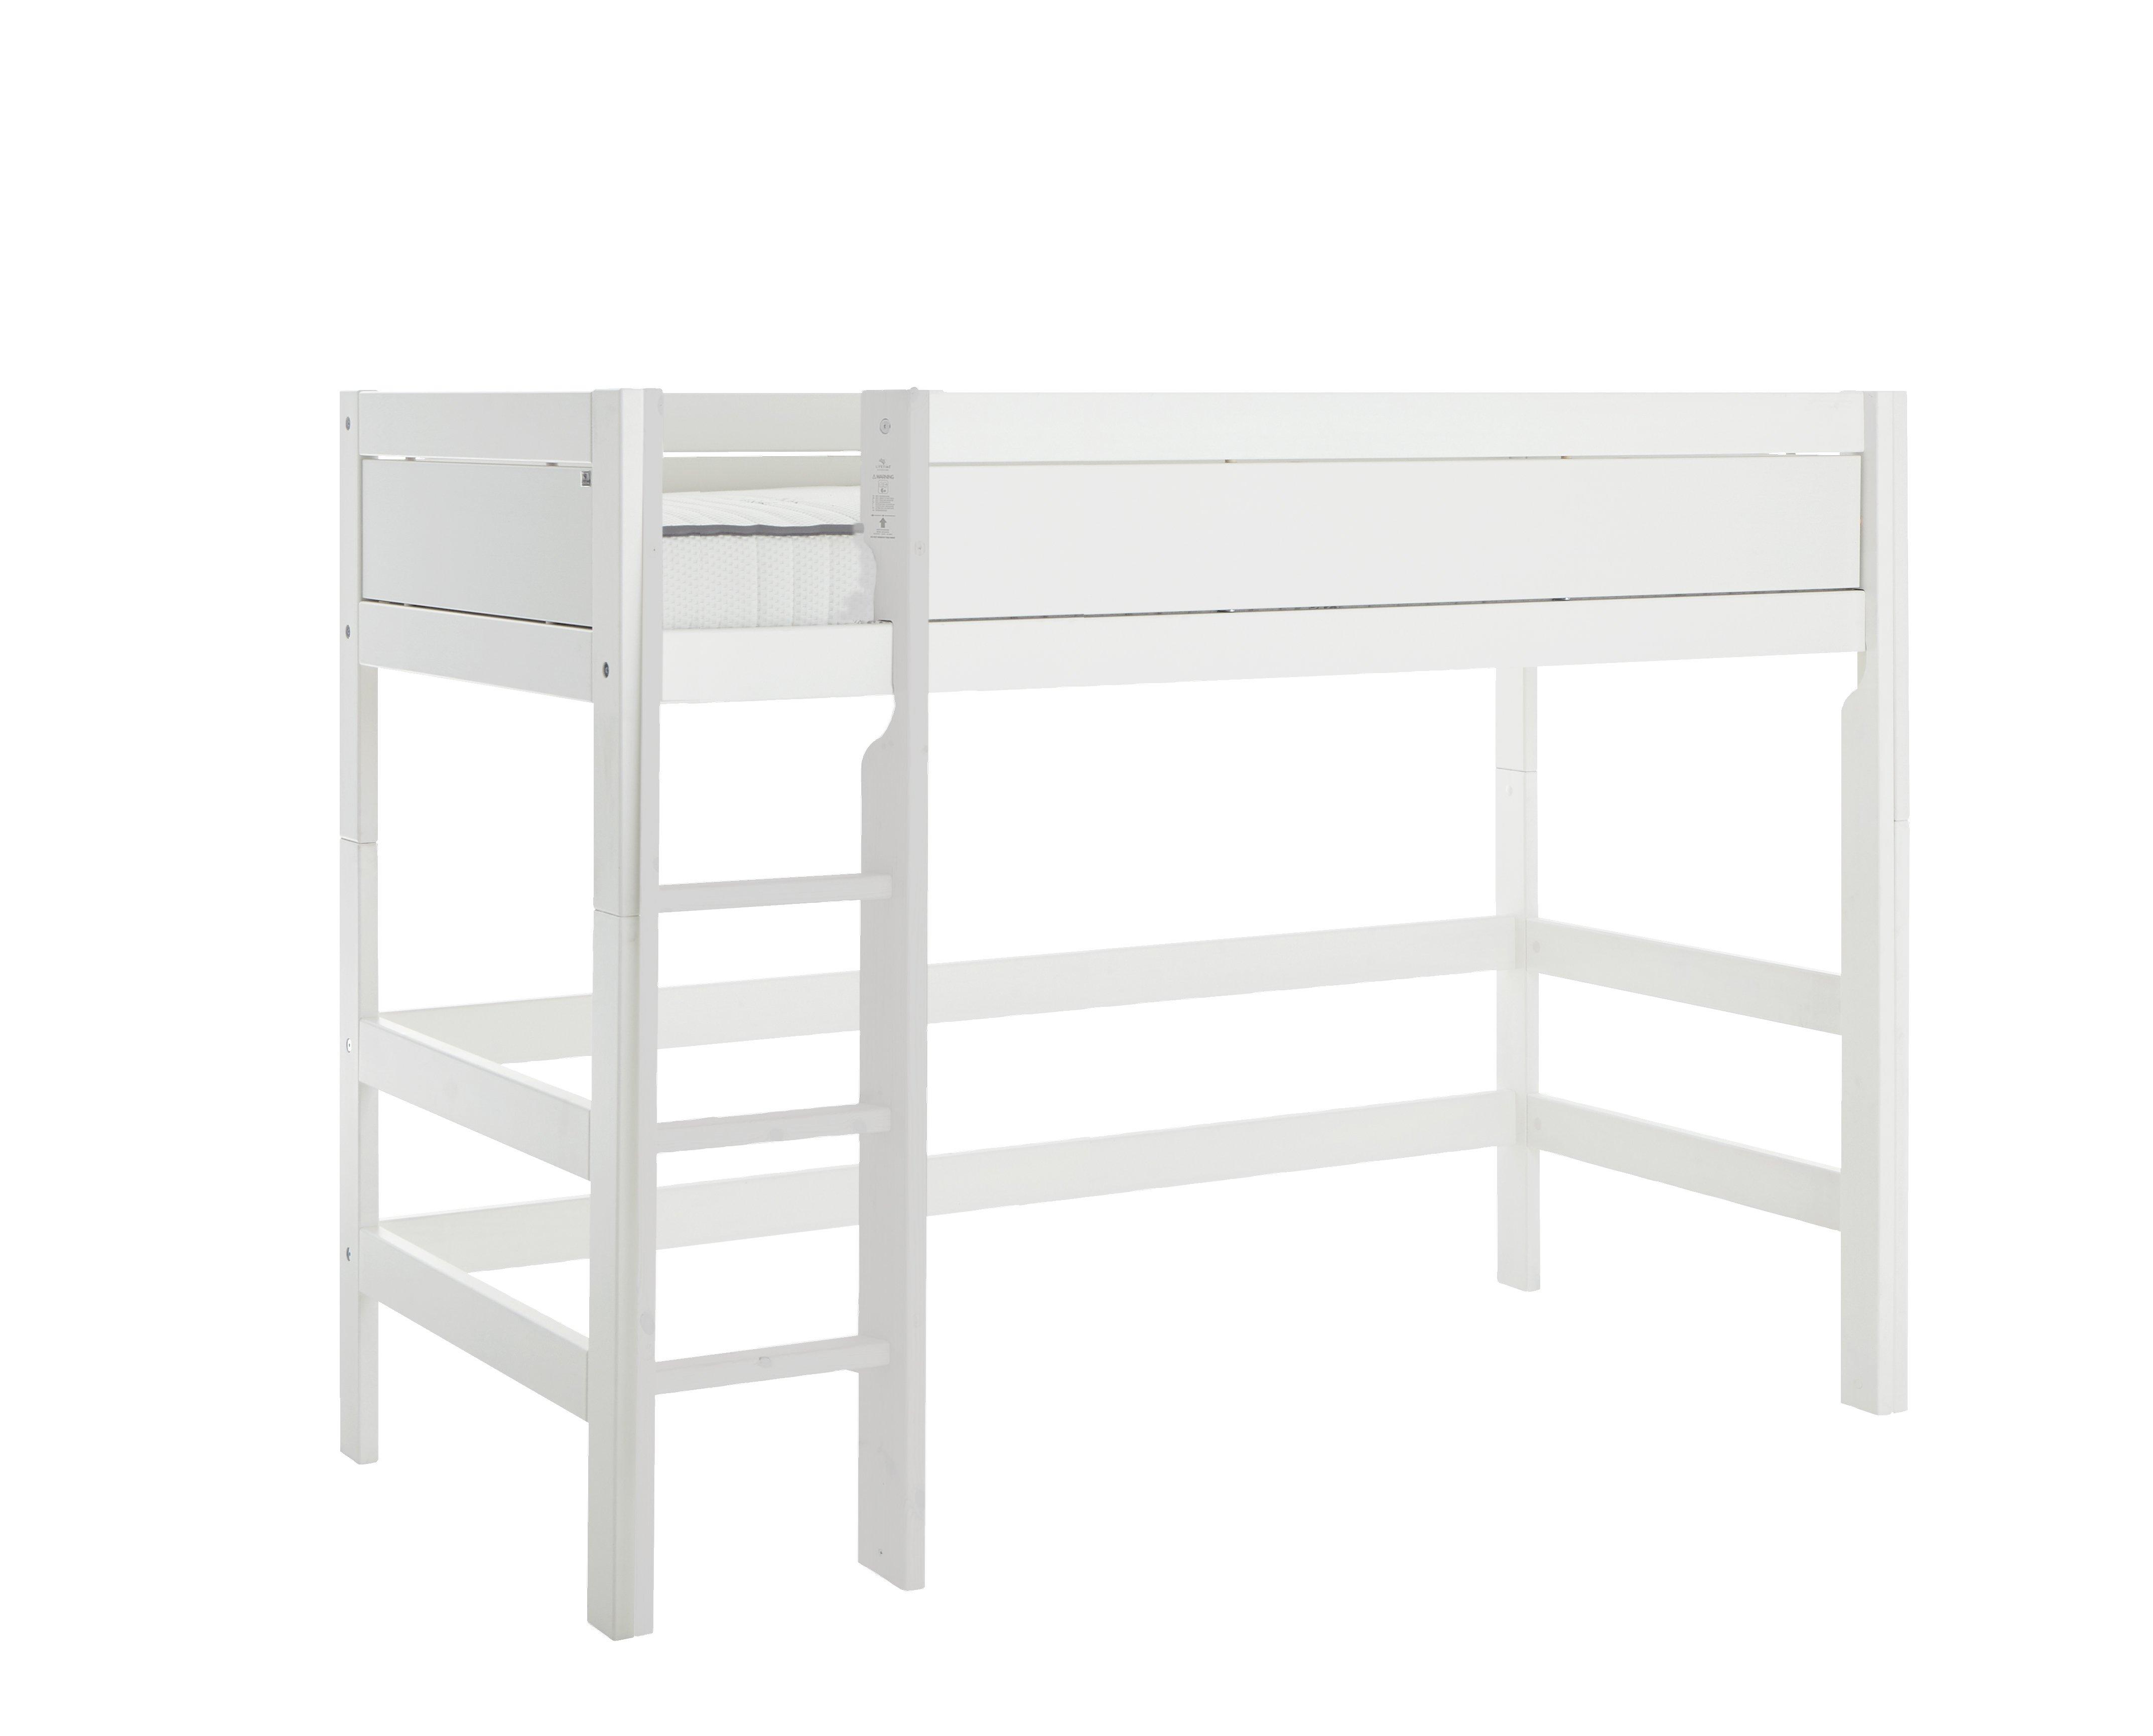 Corner bunk loft bed Low loft beds, Corner bunk beds, Bed